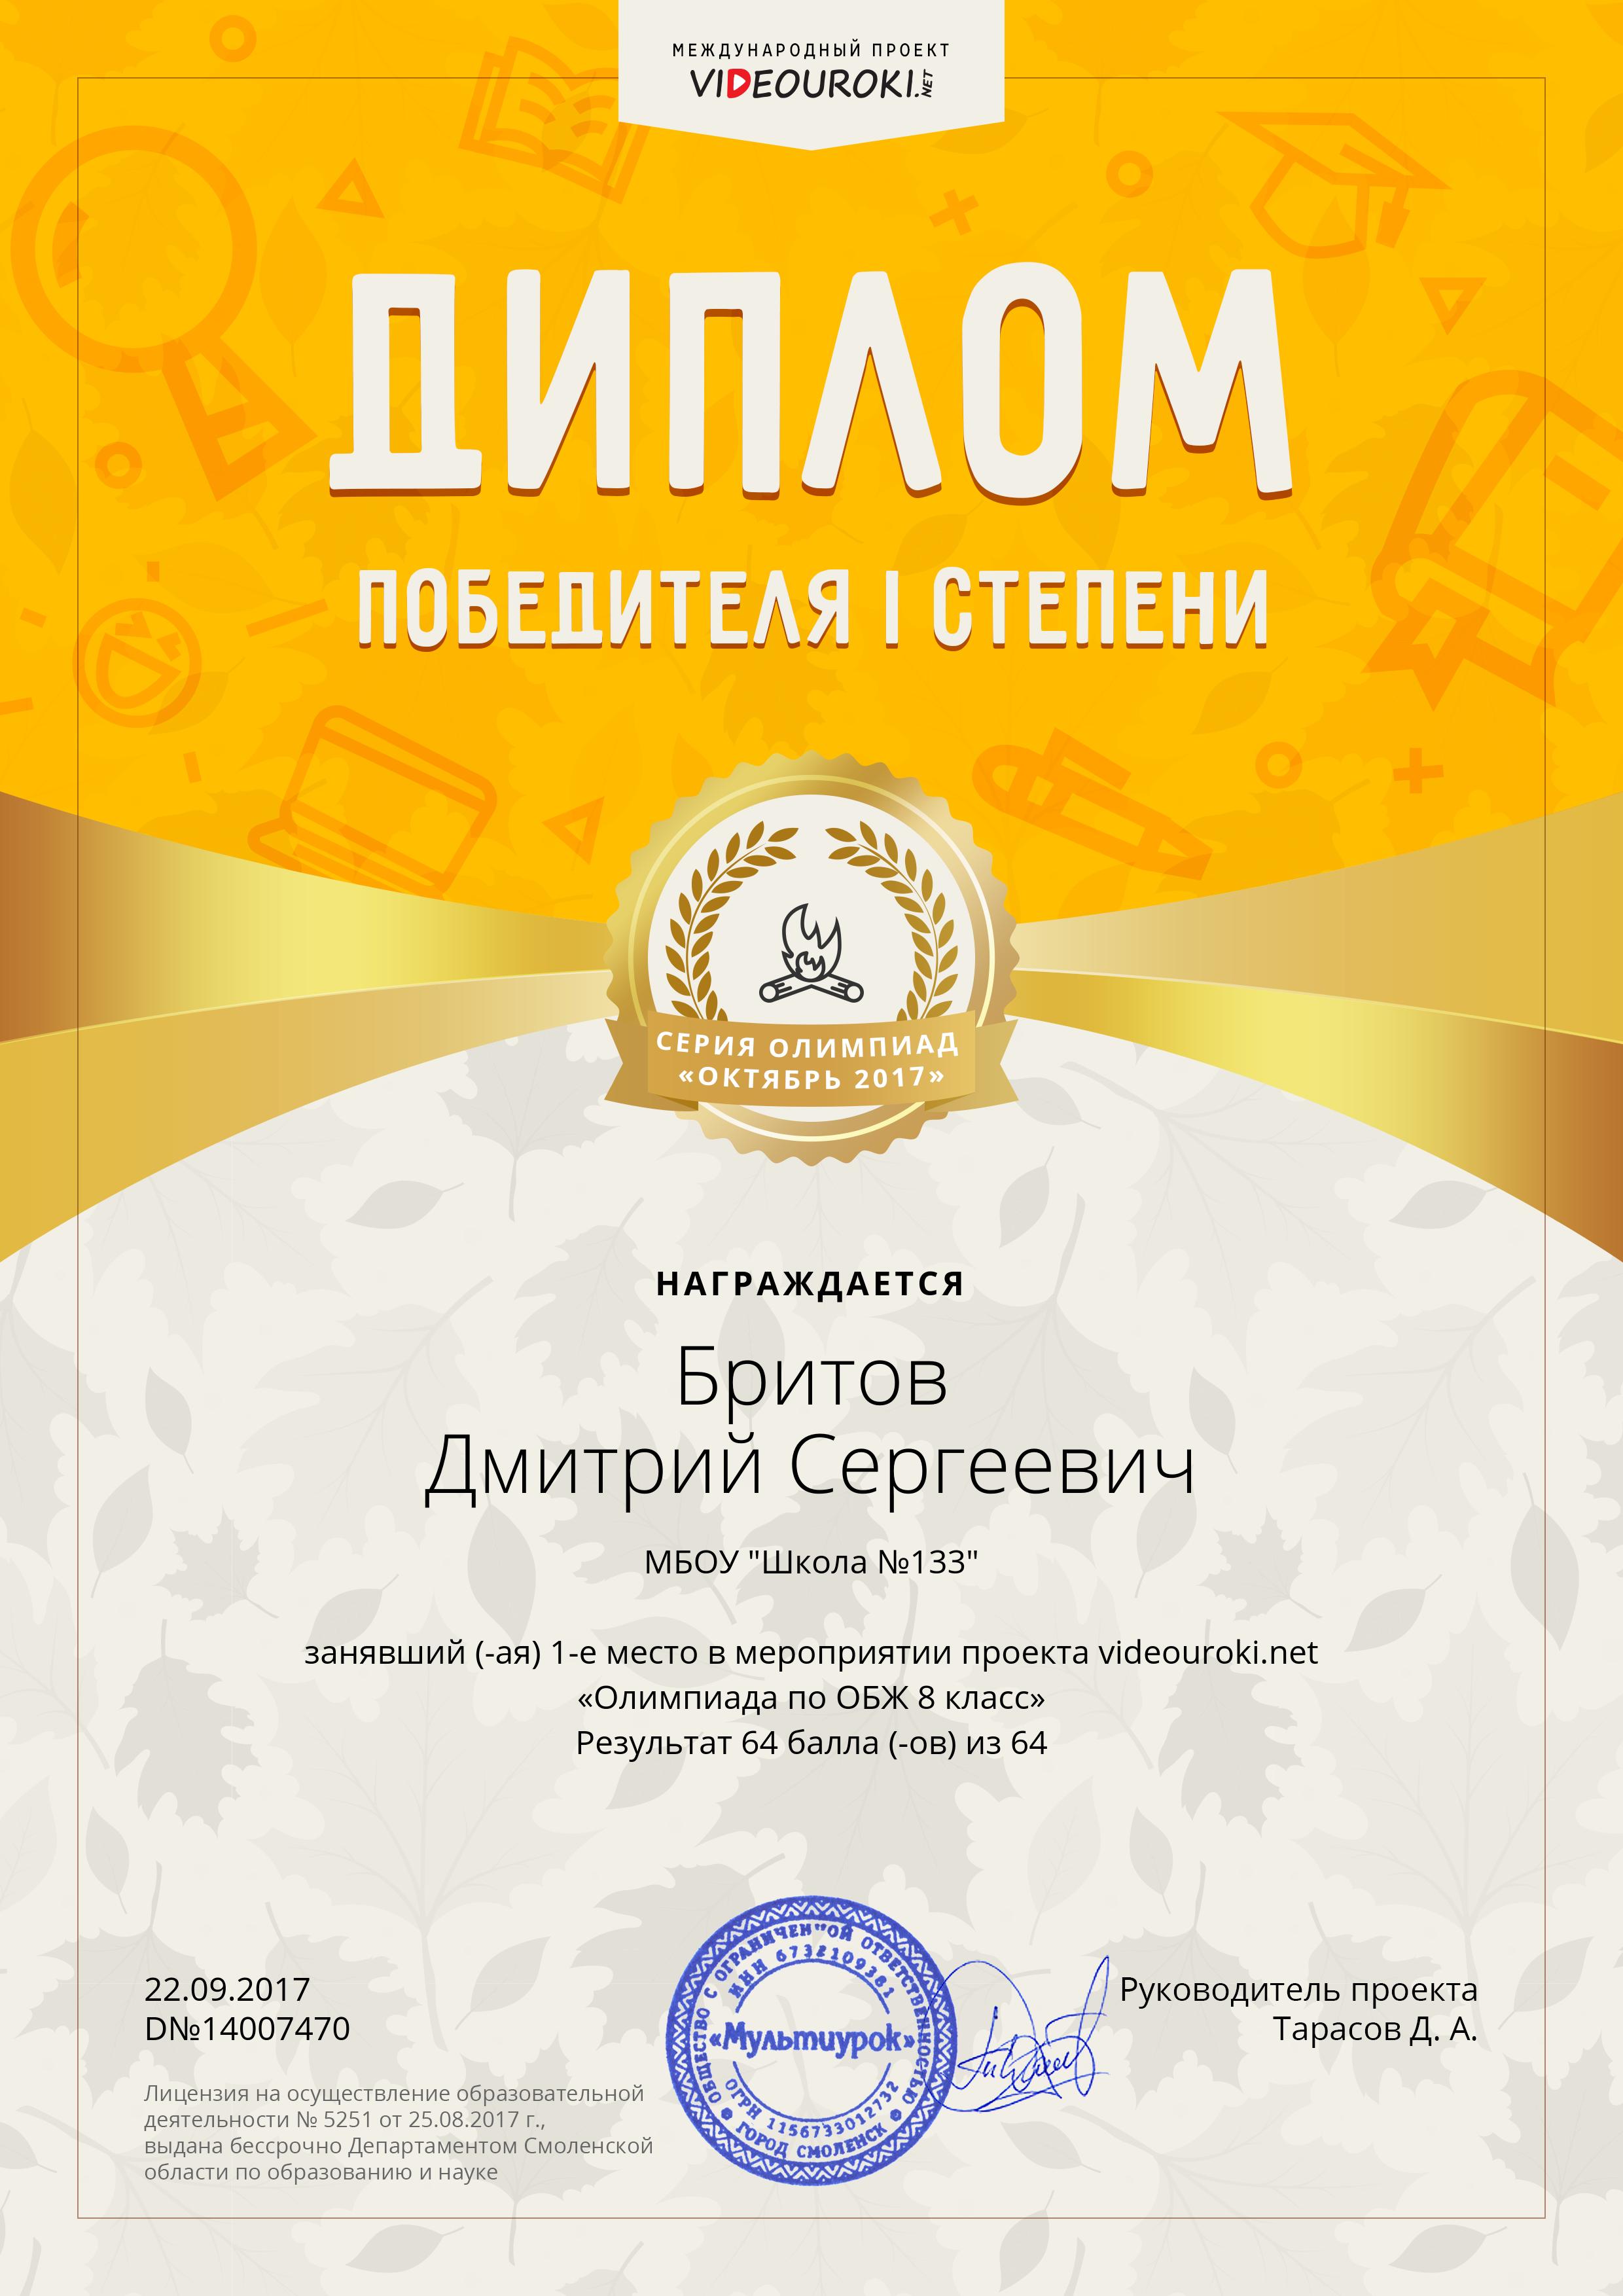 74773108. 14007470-Бритов Дмитрий Сергеевич.png